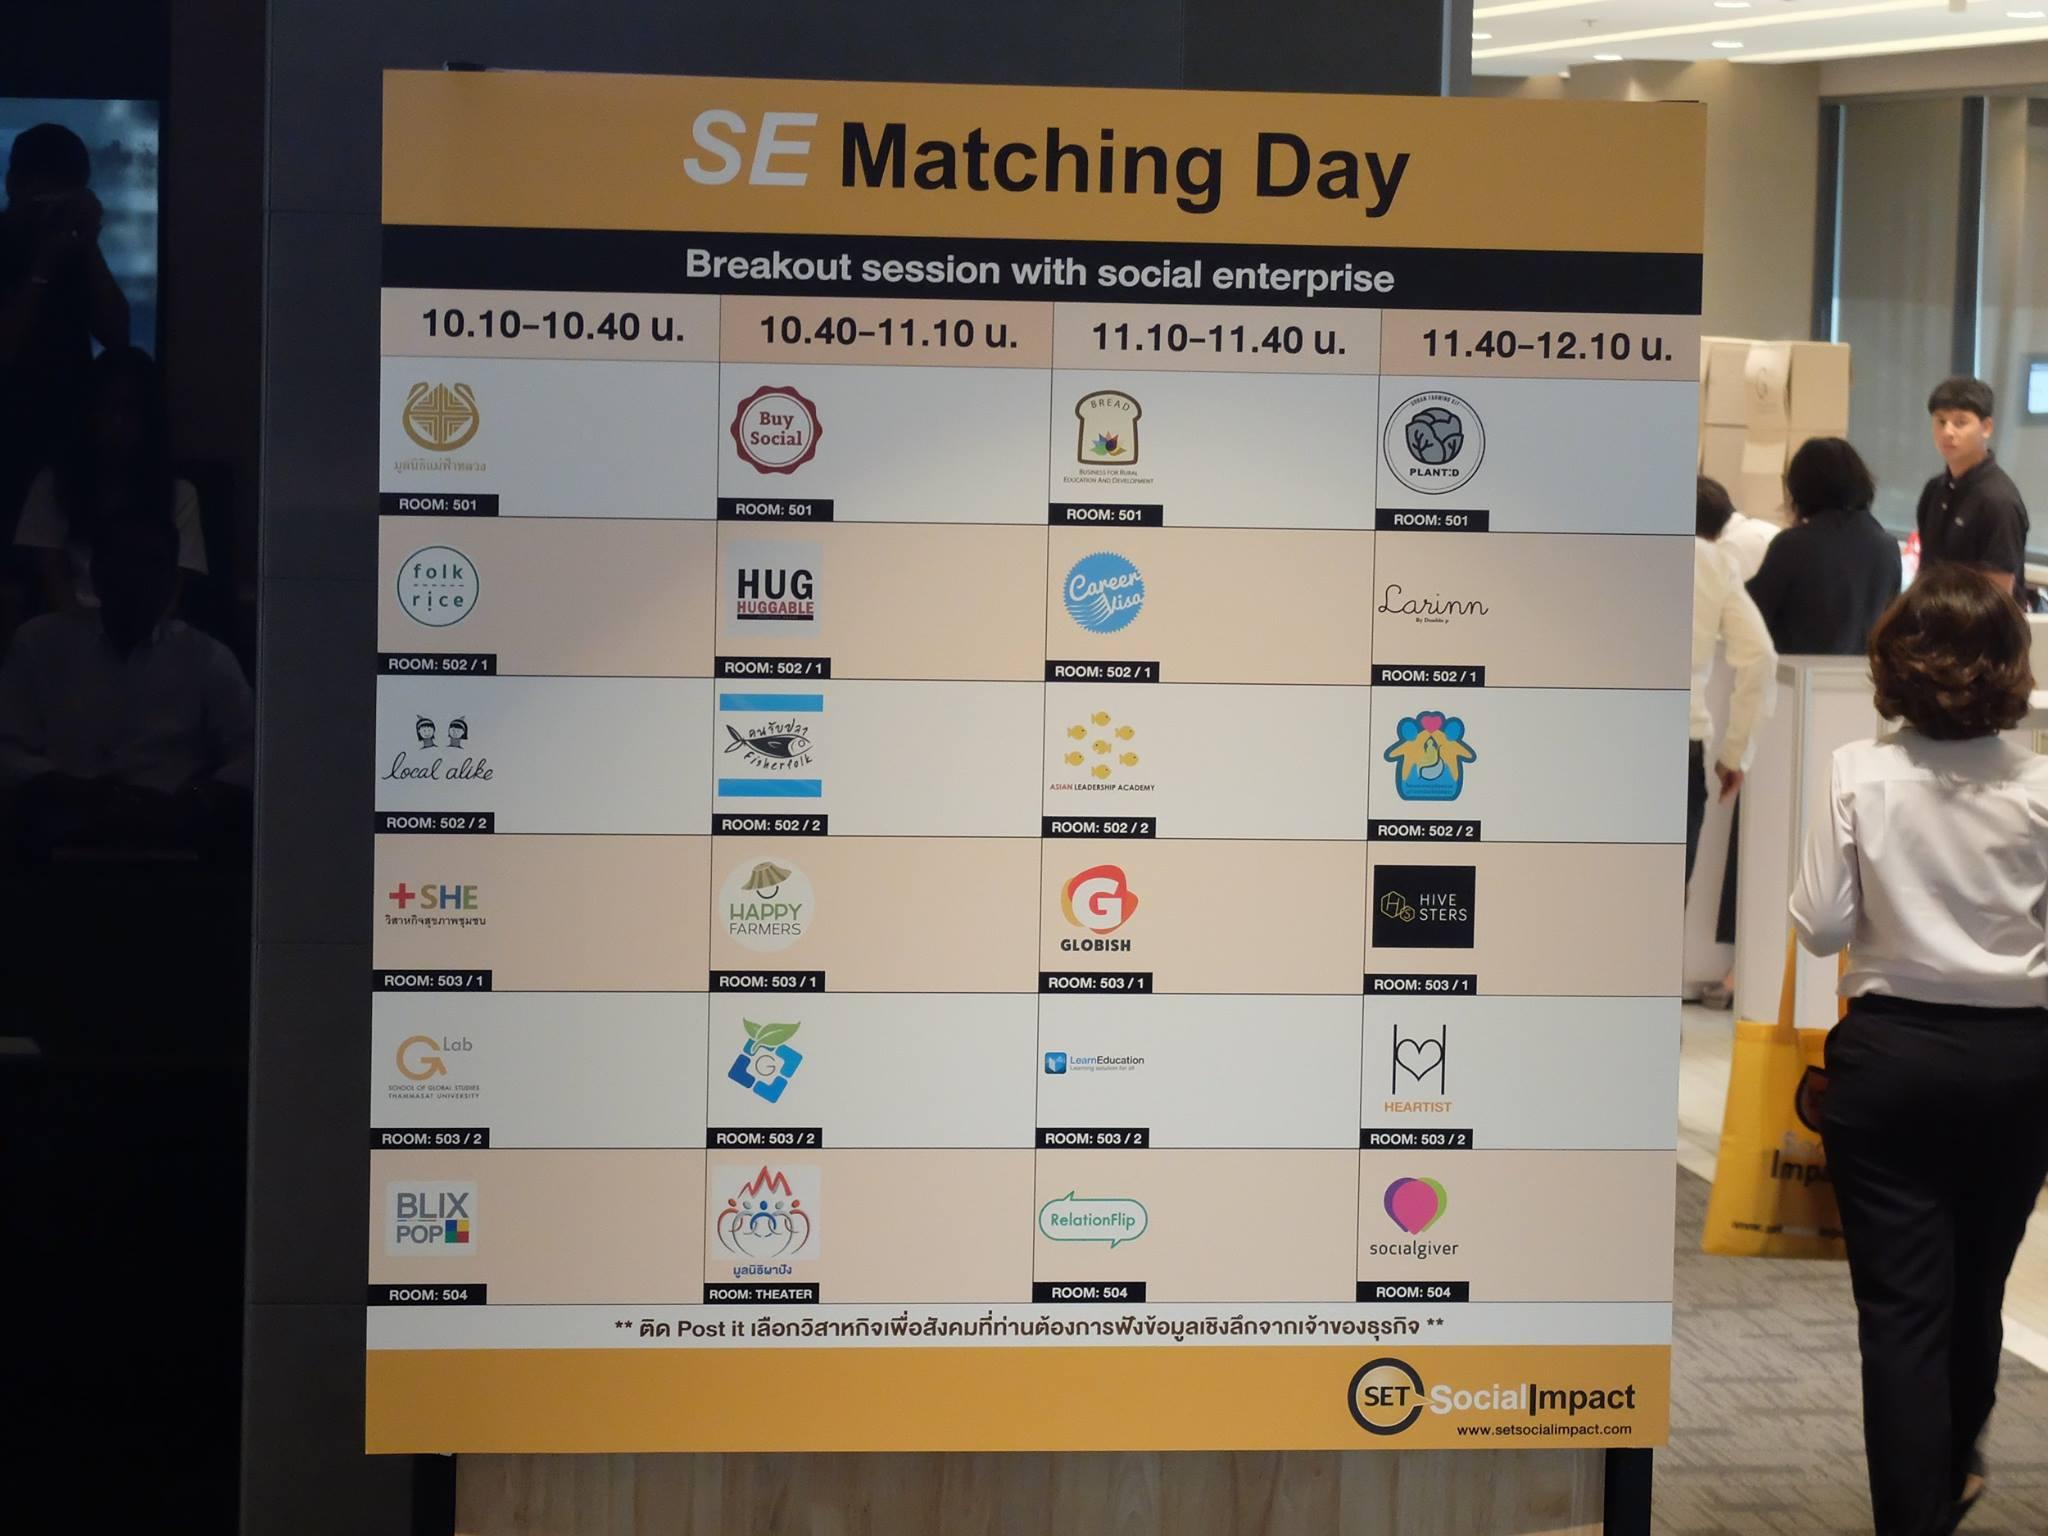 Matching Day